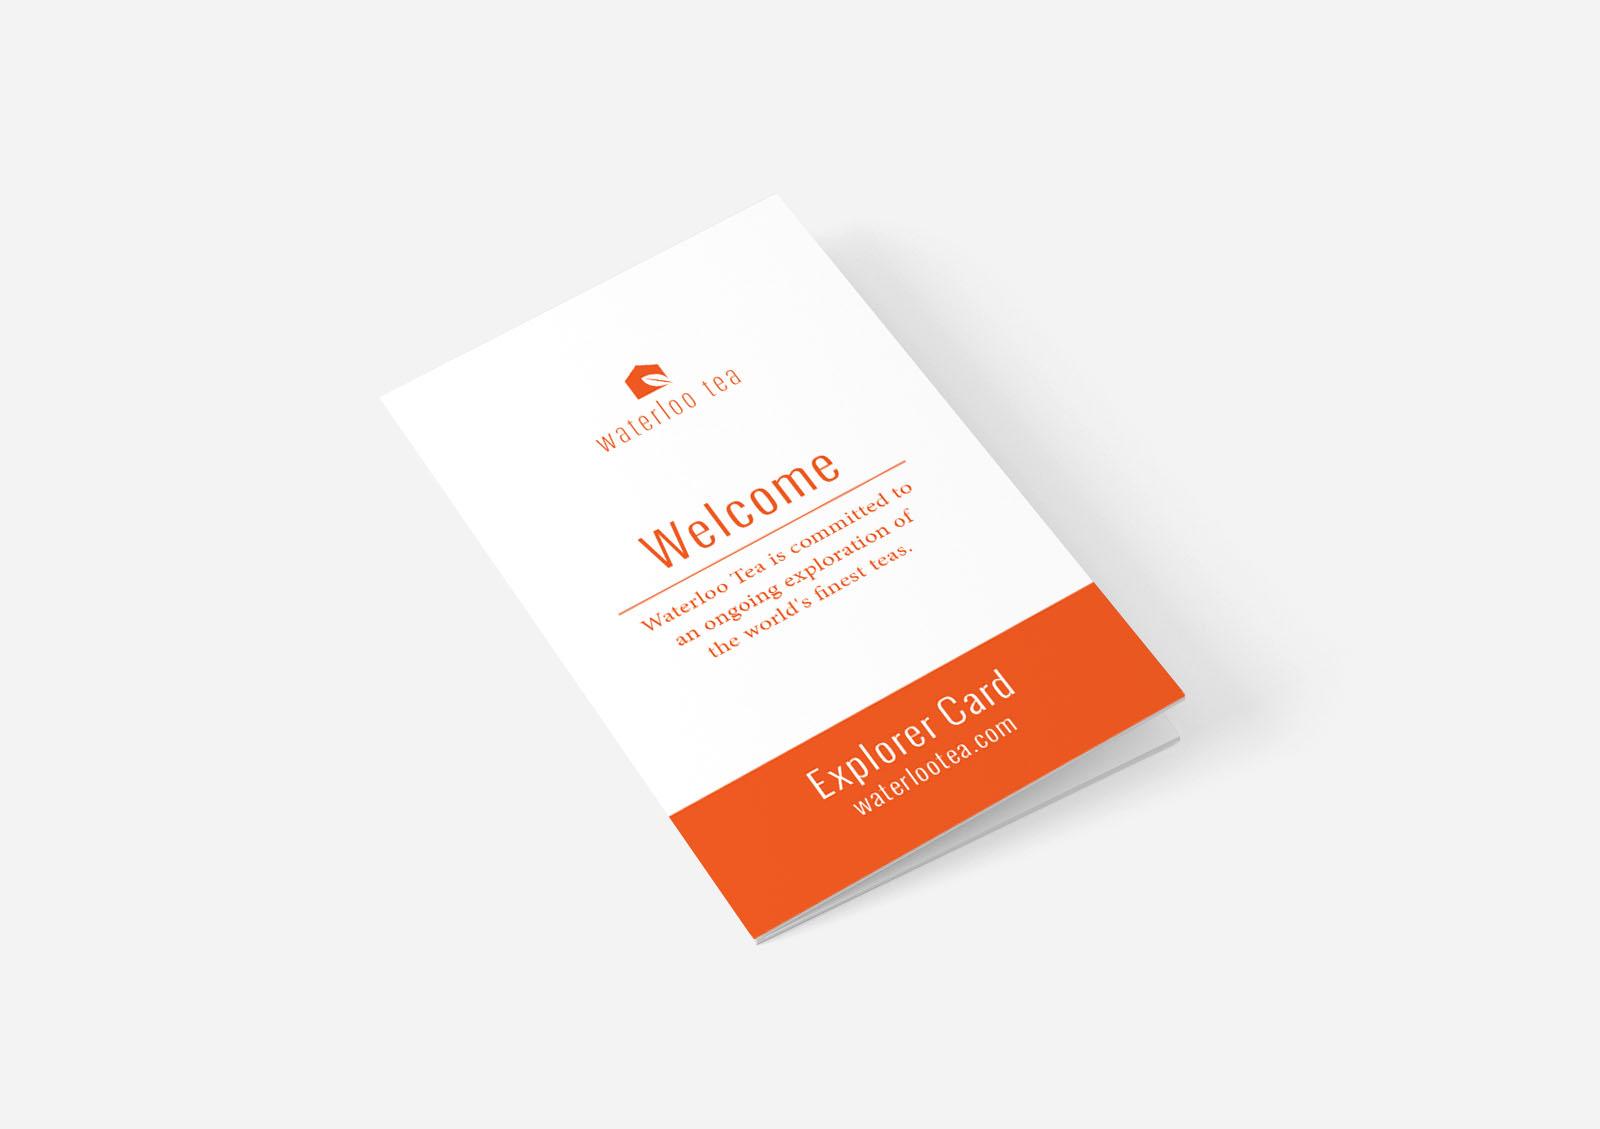 Waterloo tea Cardiff loyalty card design